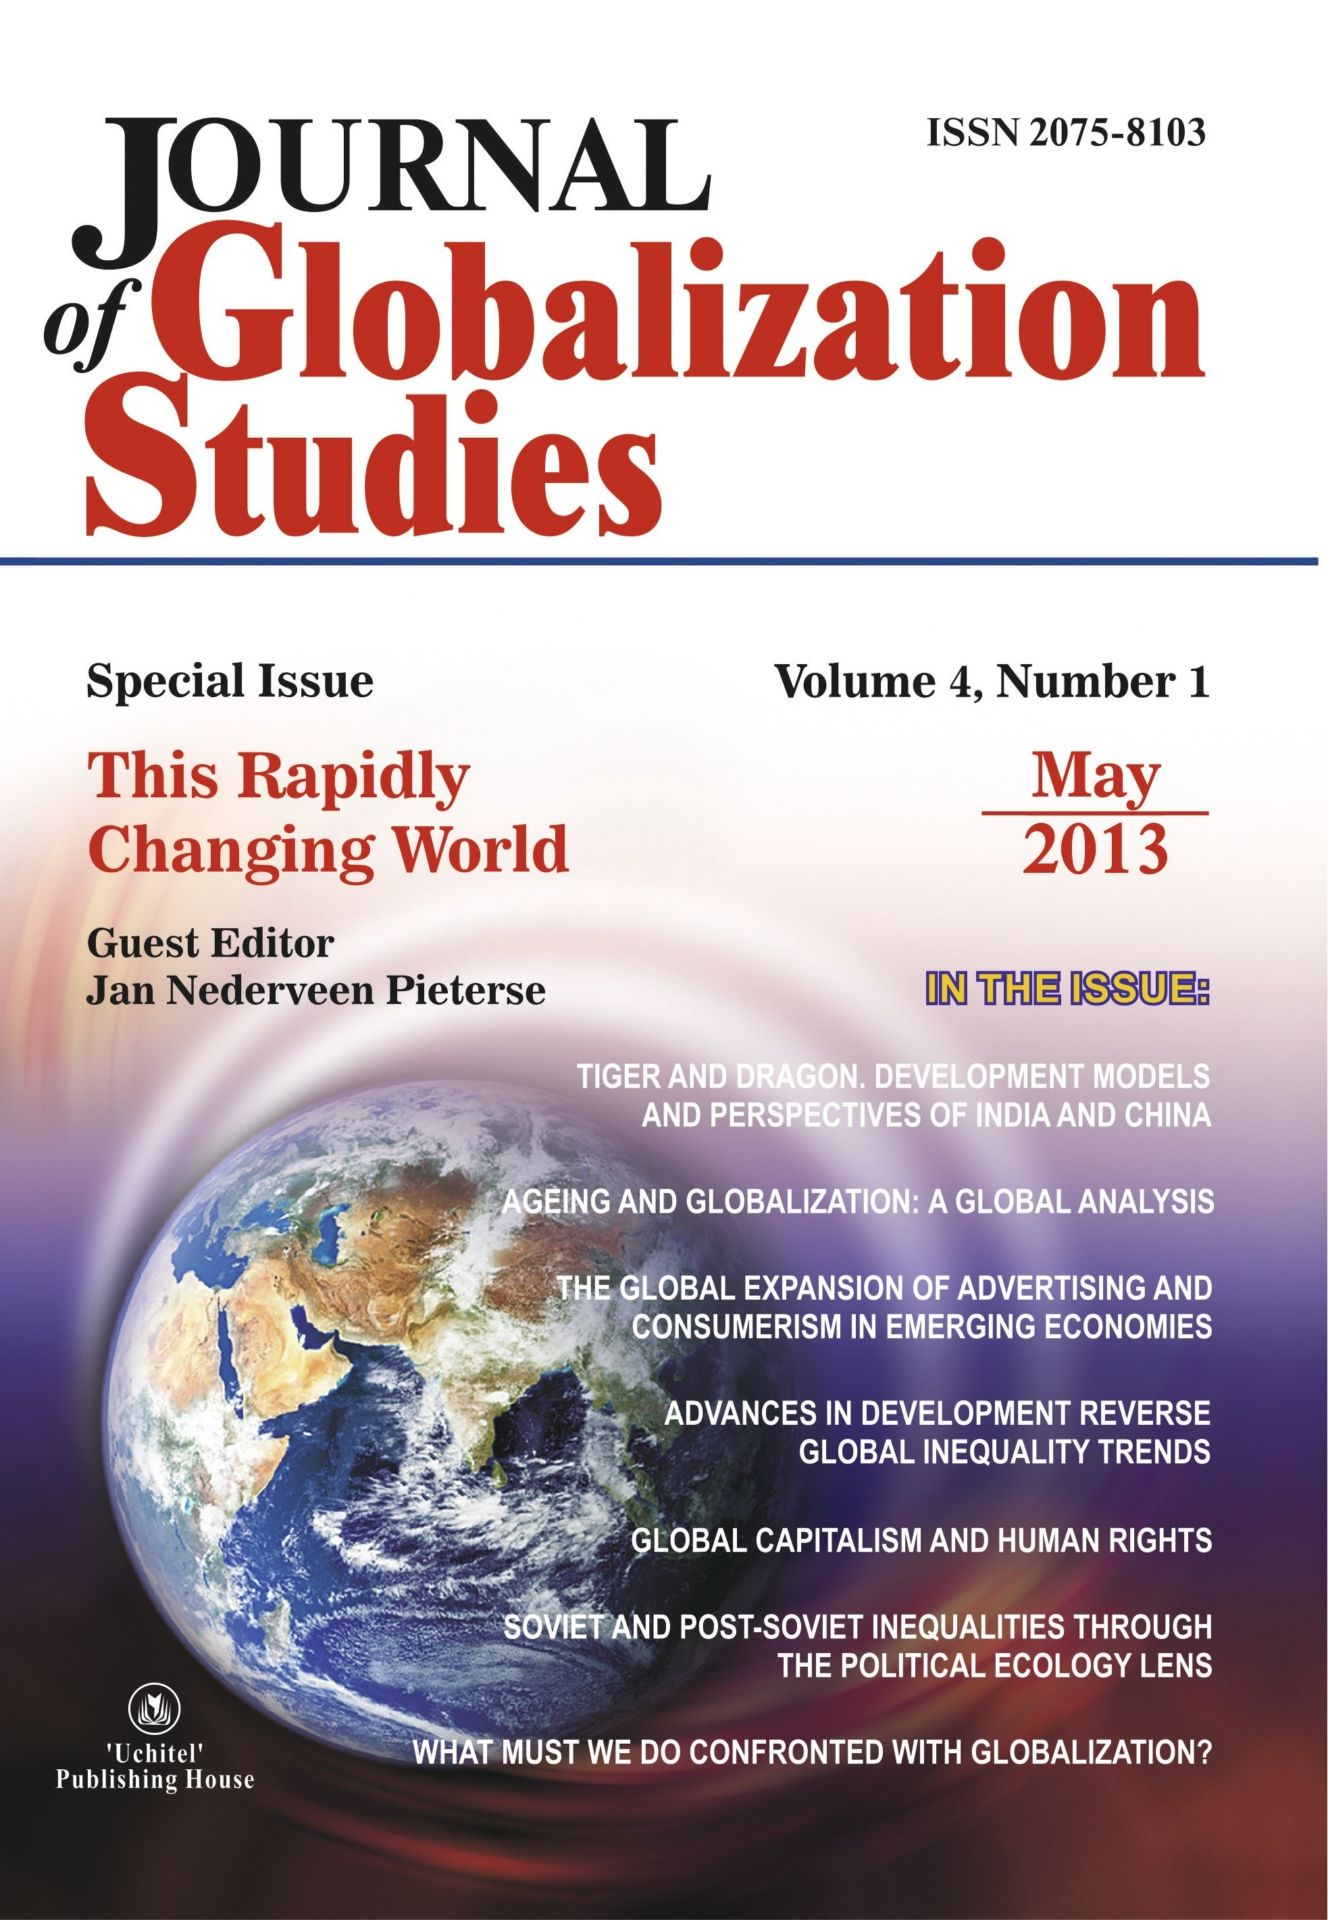 Journal of Globalization Studies Volume 4, Number 1, 2013 г. Журнал глобализационных исследований Международный журнал на английском языке